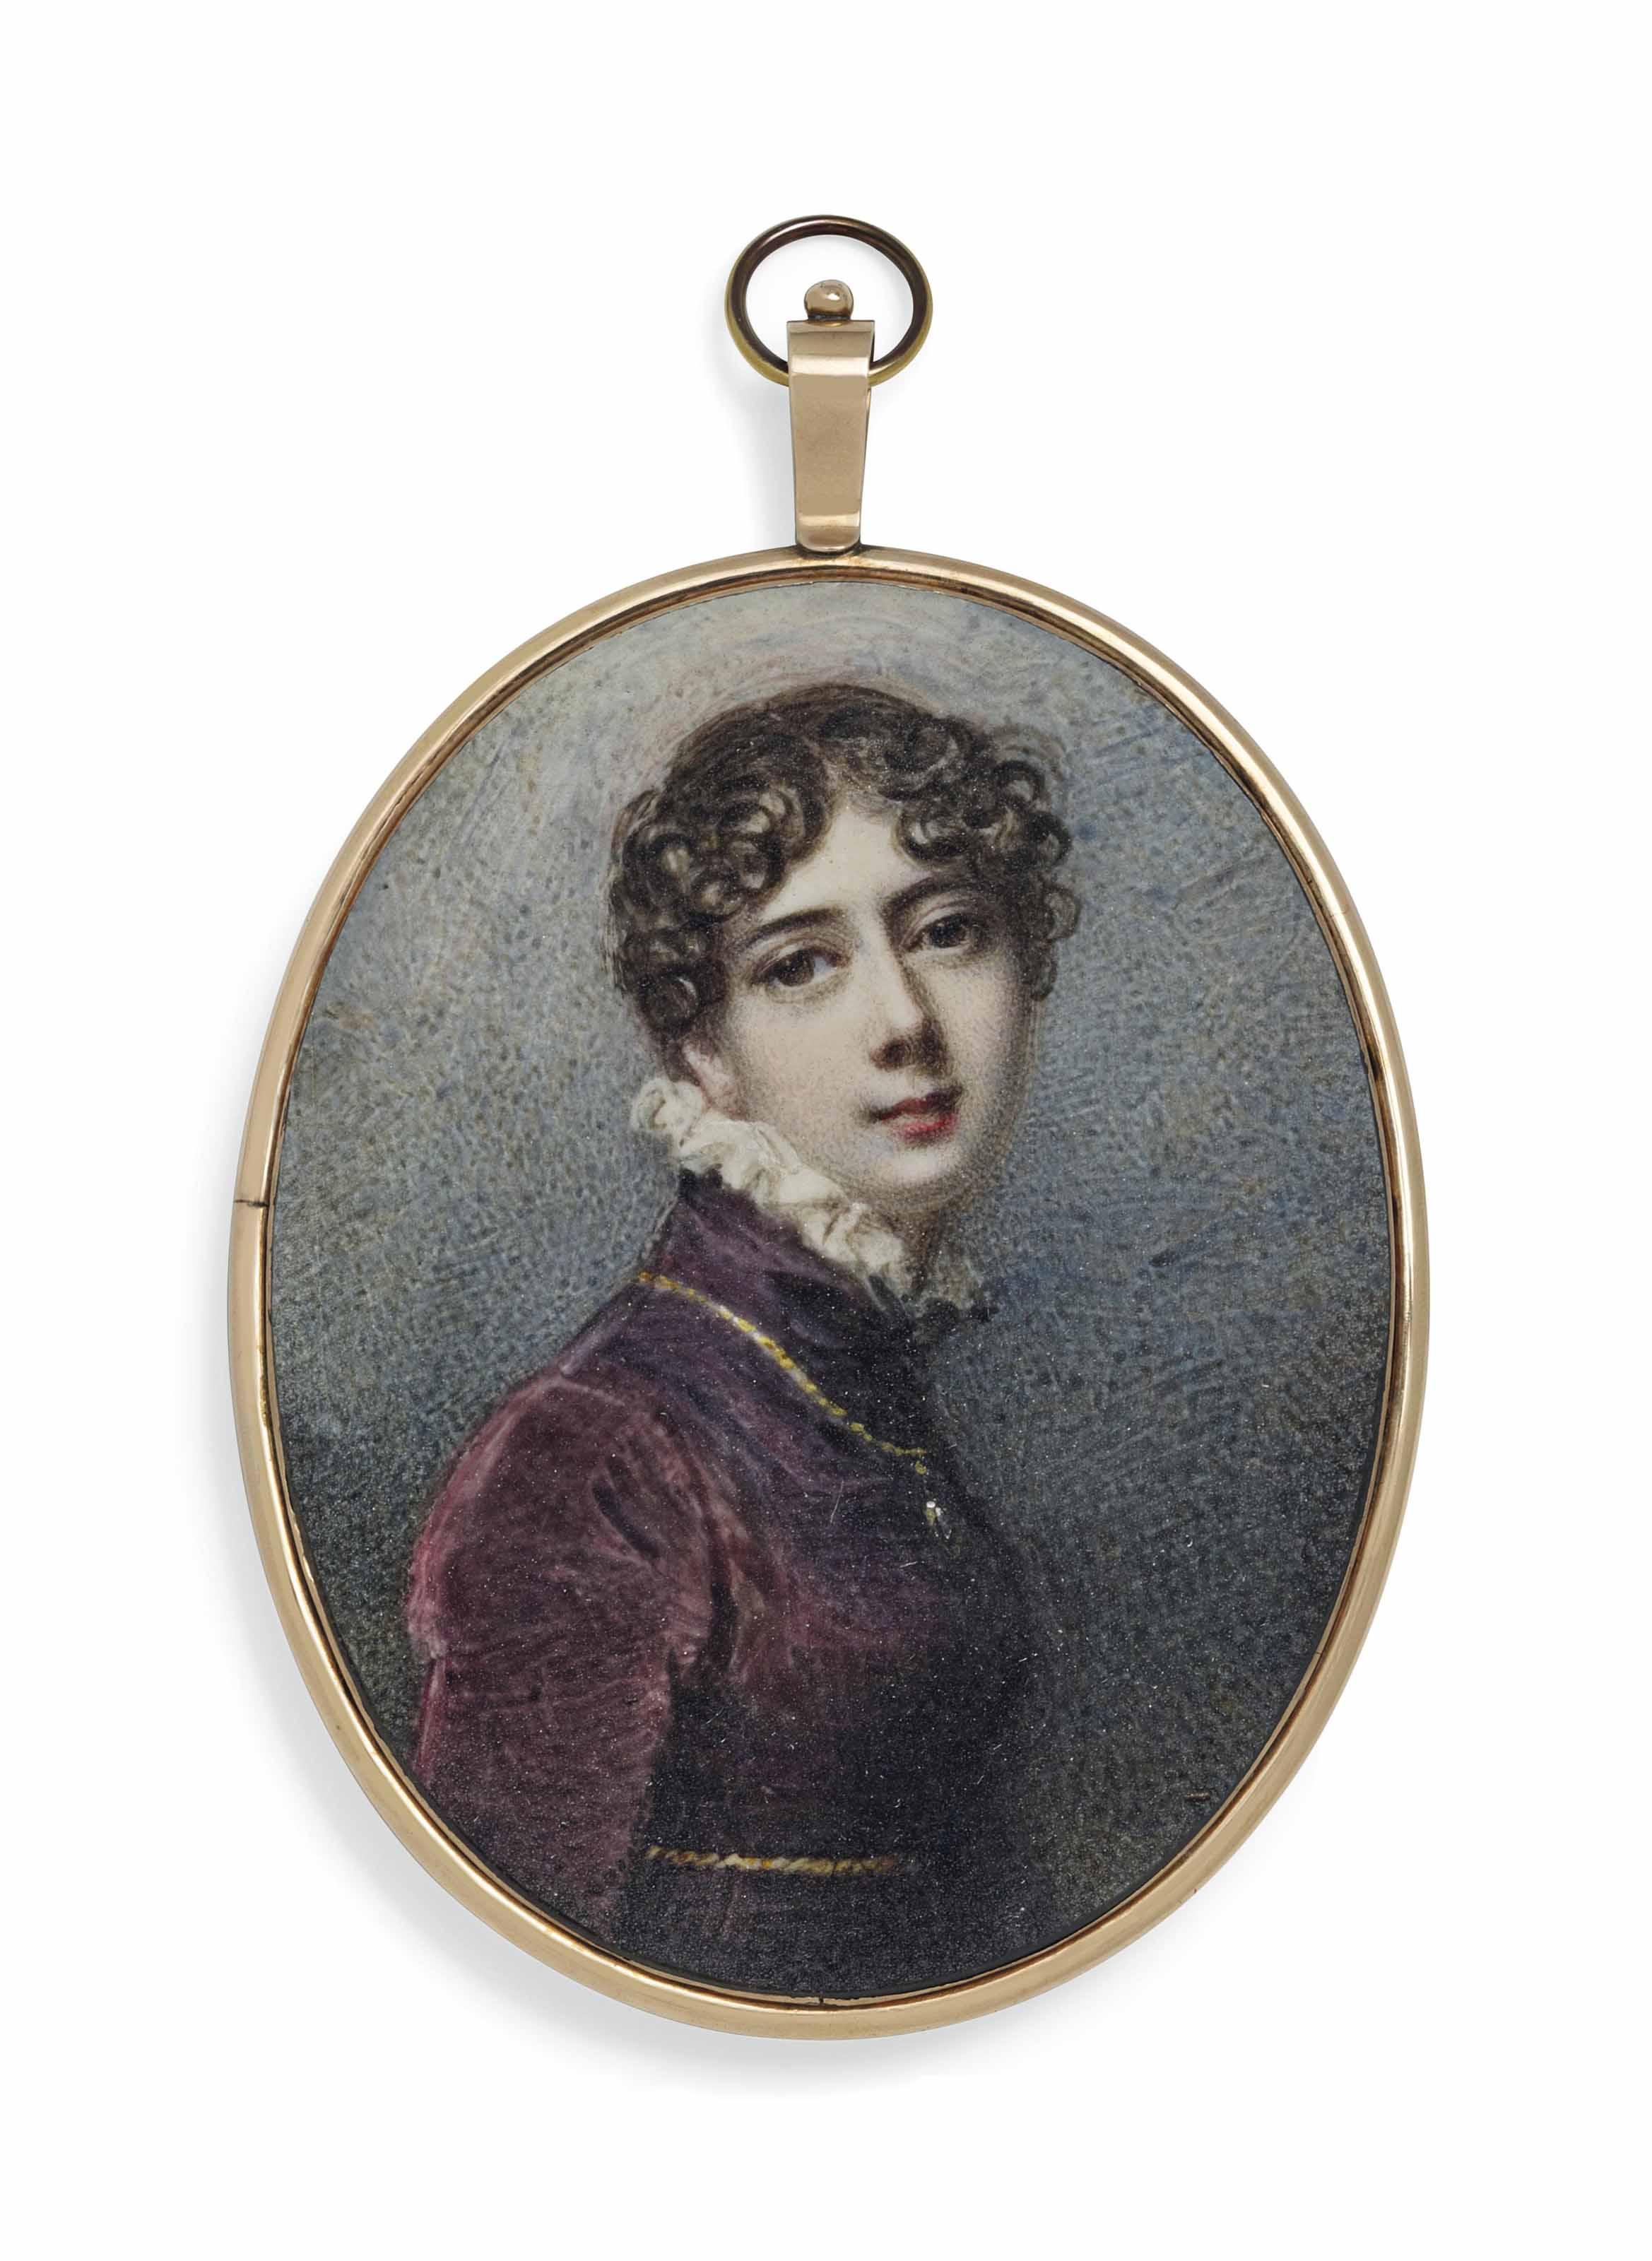 ANNE MEE, NEE FOLDSONE (BRITISH, C. 1770/1775 - 1851)